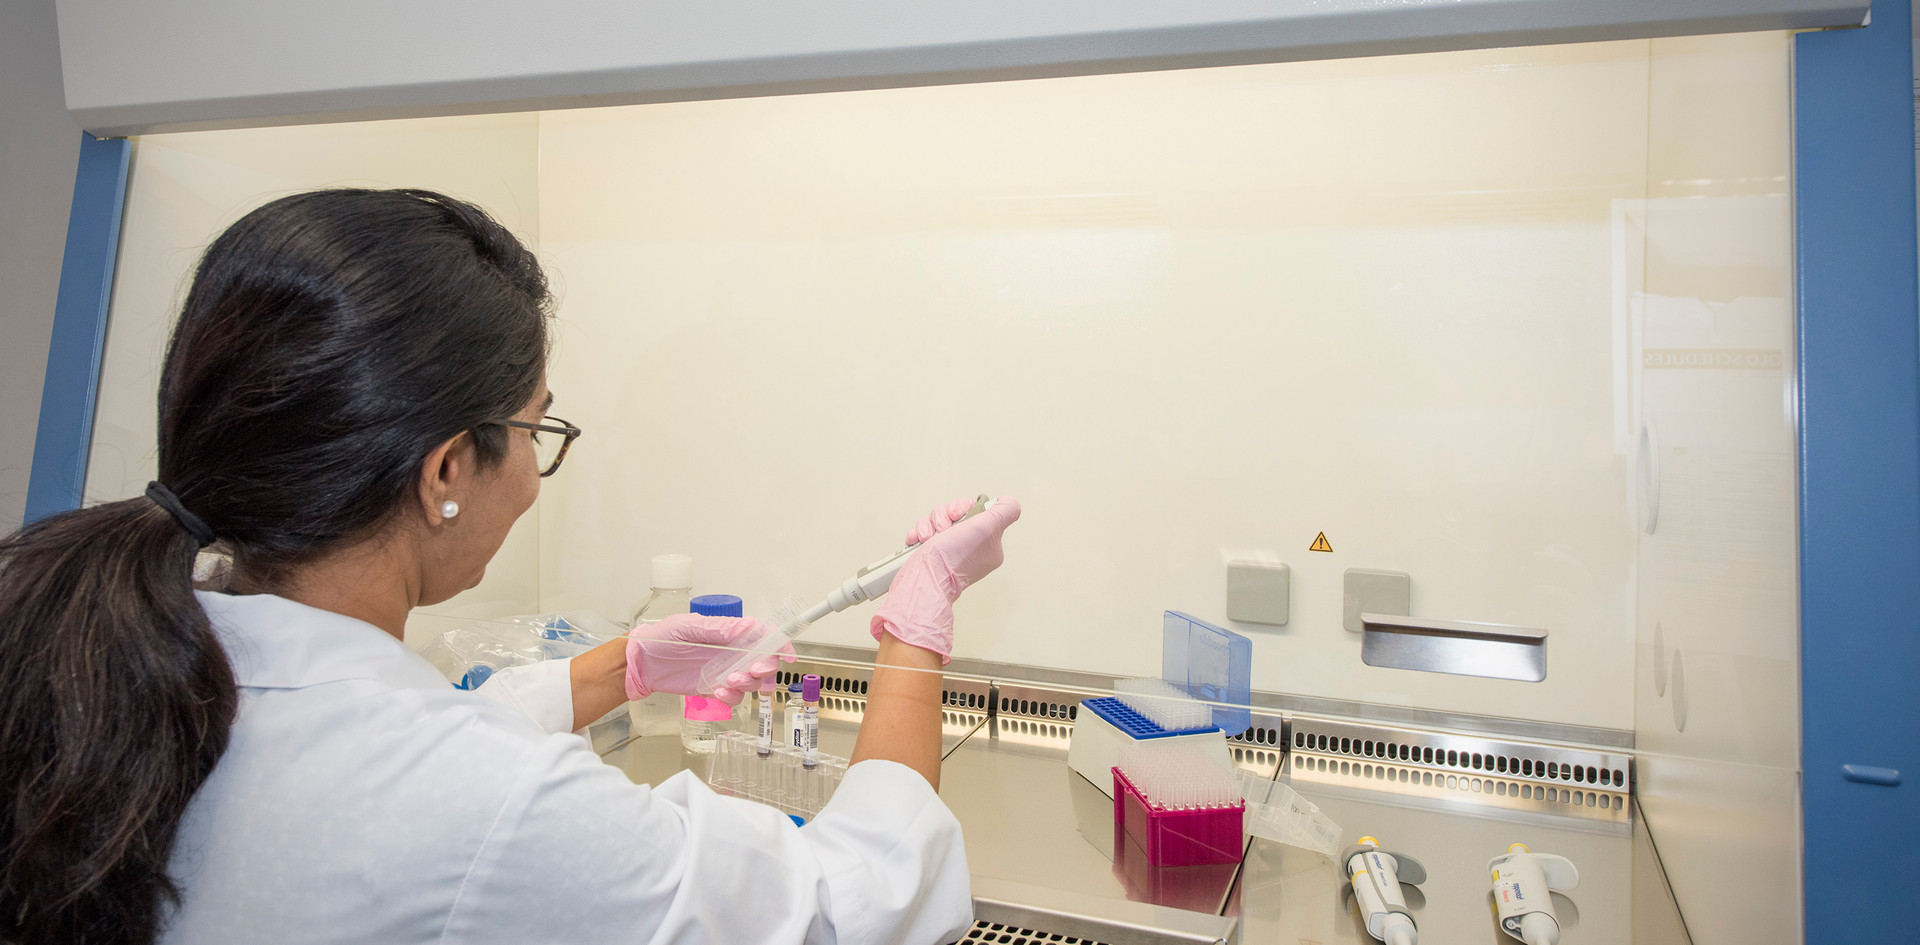 Auckland Clinical Studies Biomaker Services